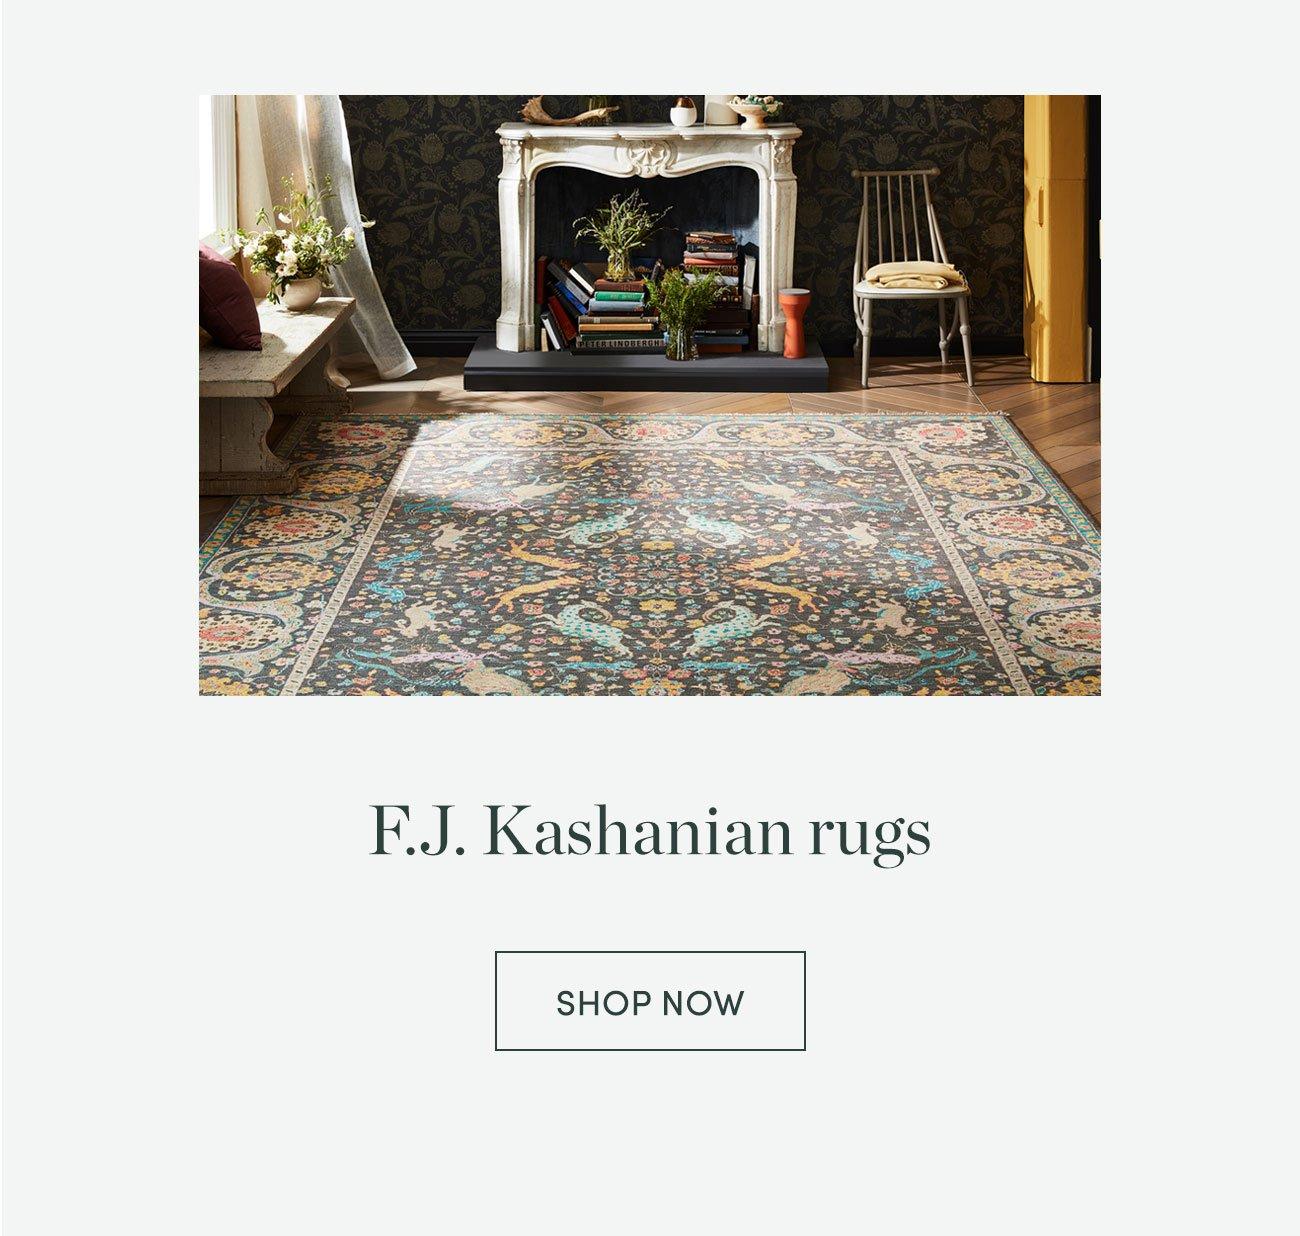 F.J. Kashanian rugs